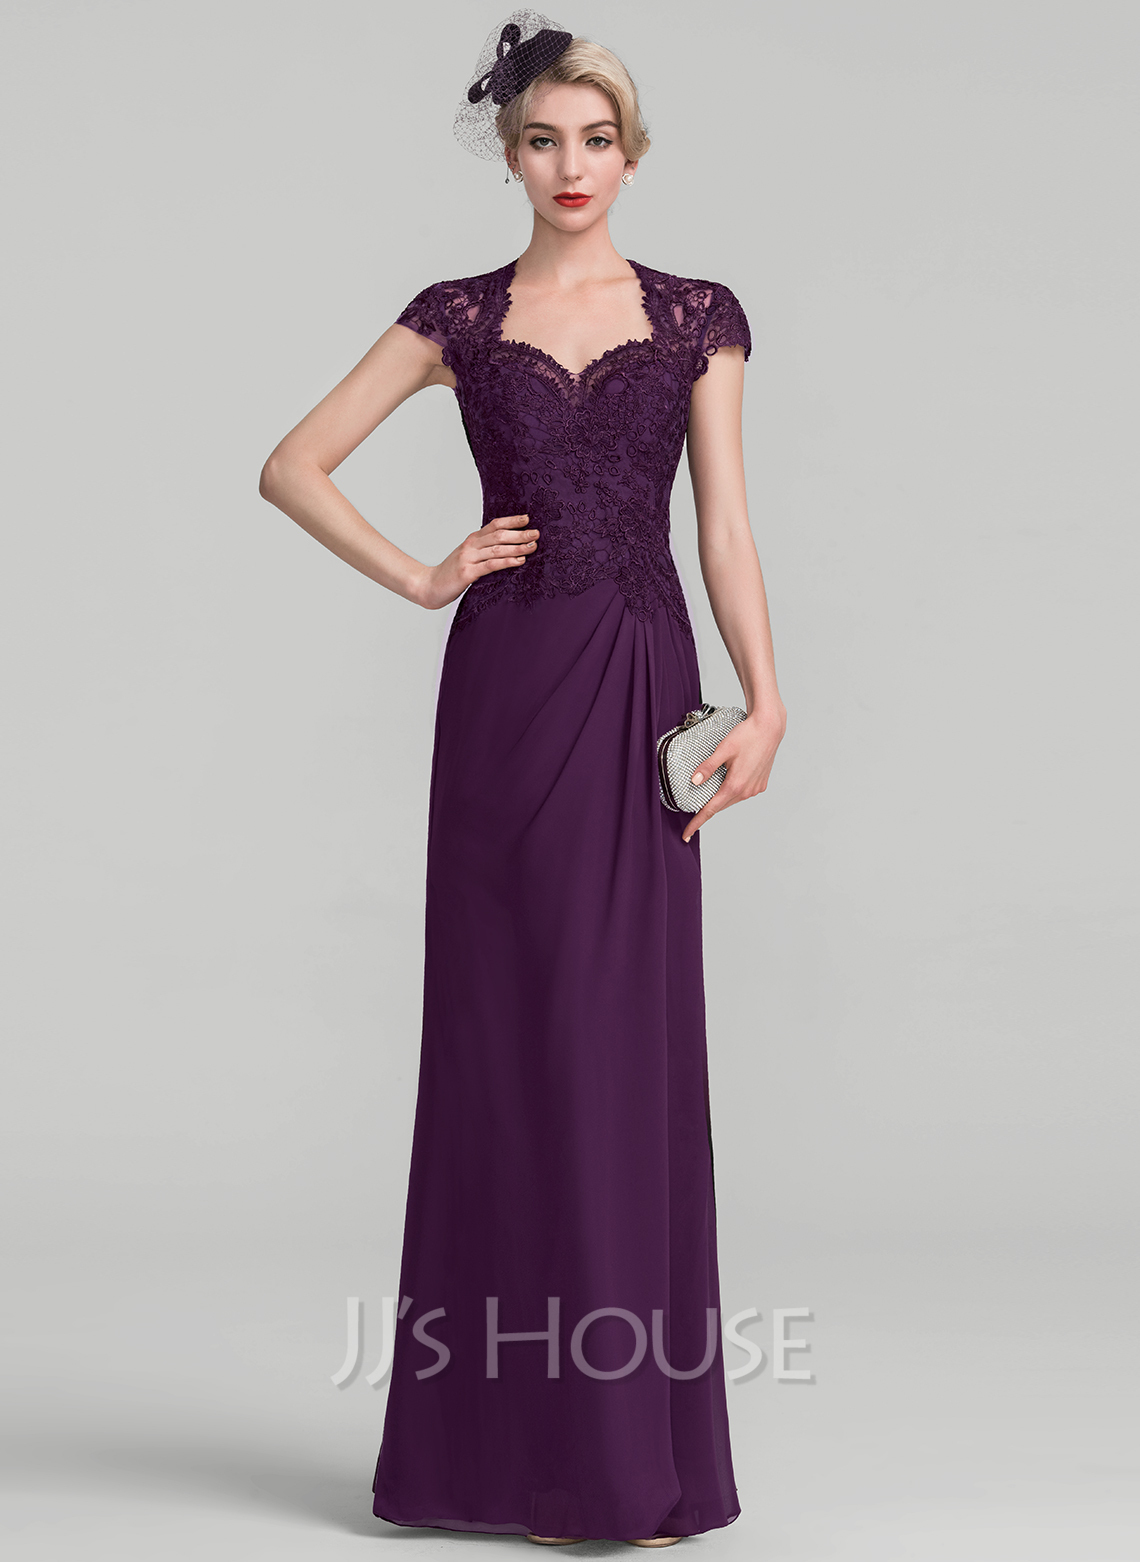 A-Line/Princess Sweetheart Floor-Length Chiffon Lace Evening Dress With Ruffle